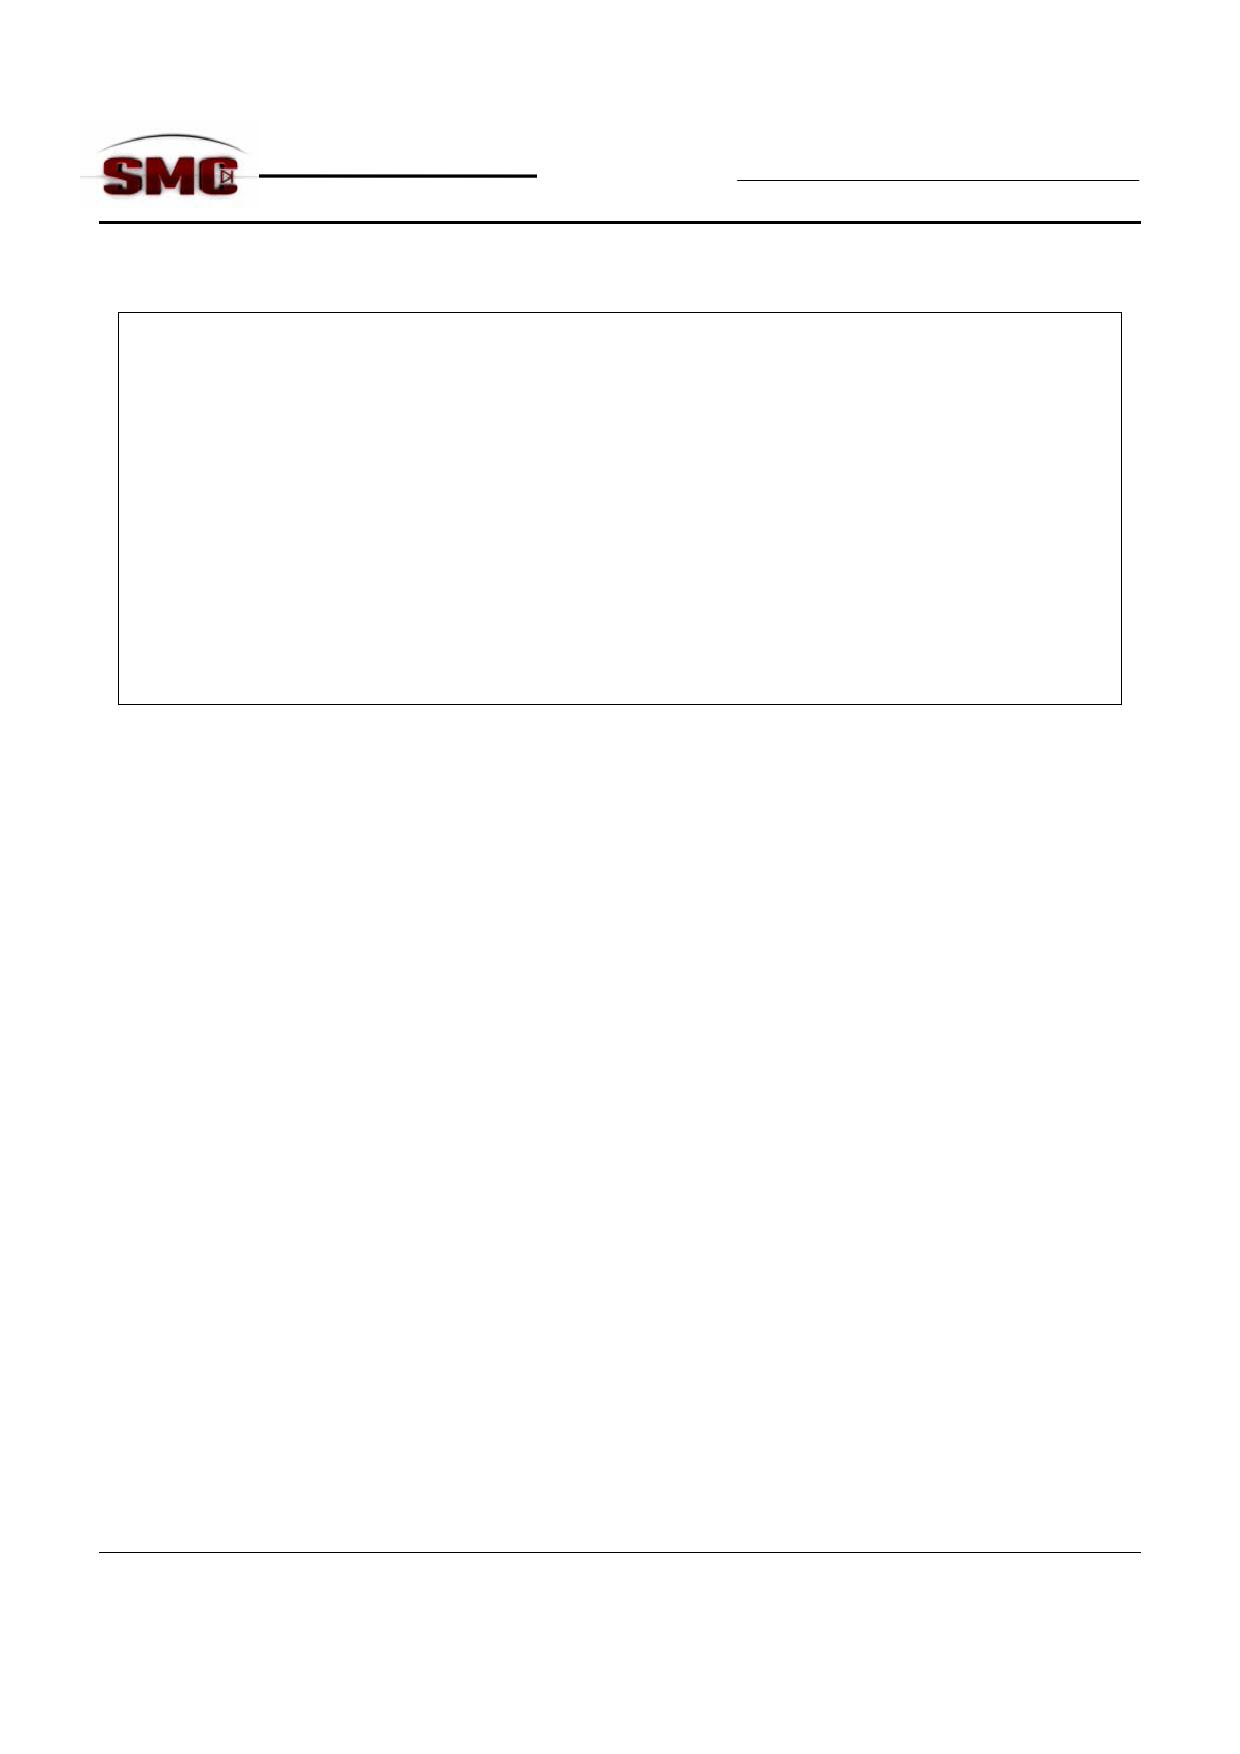 MR858 pdf, 반도체, 판매, 대치품